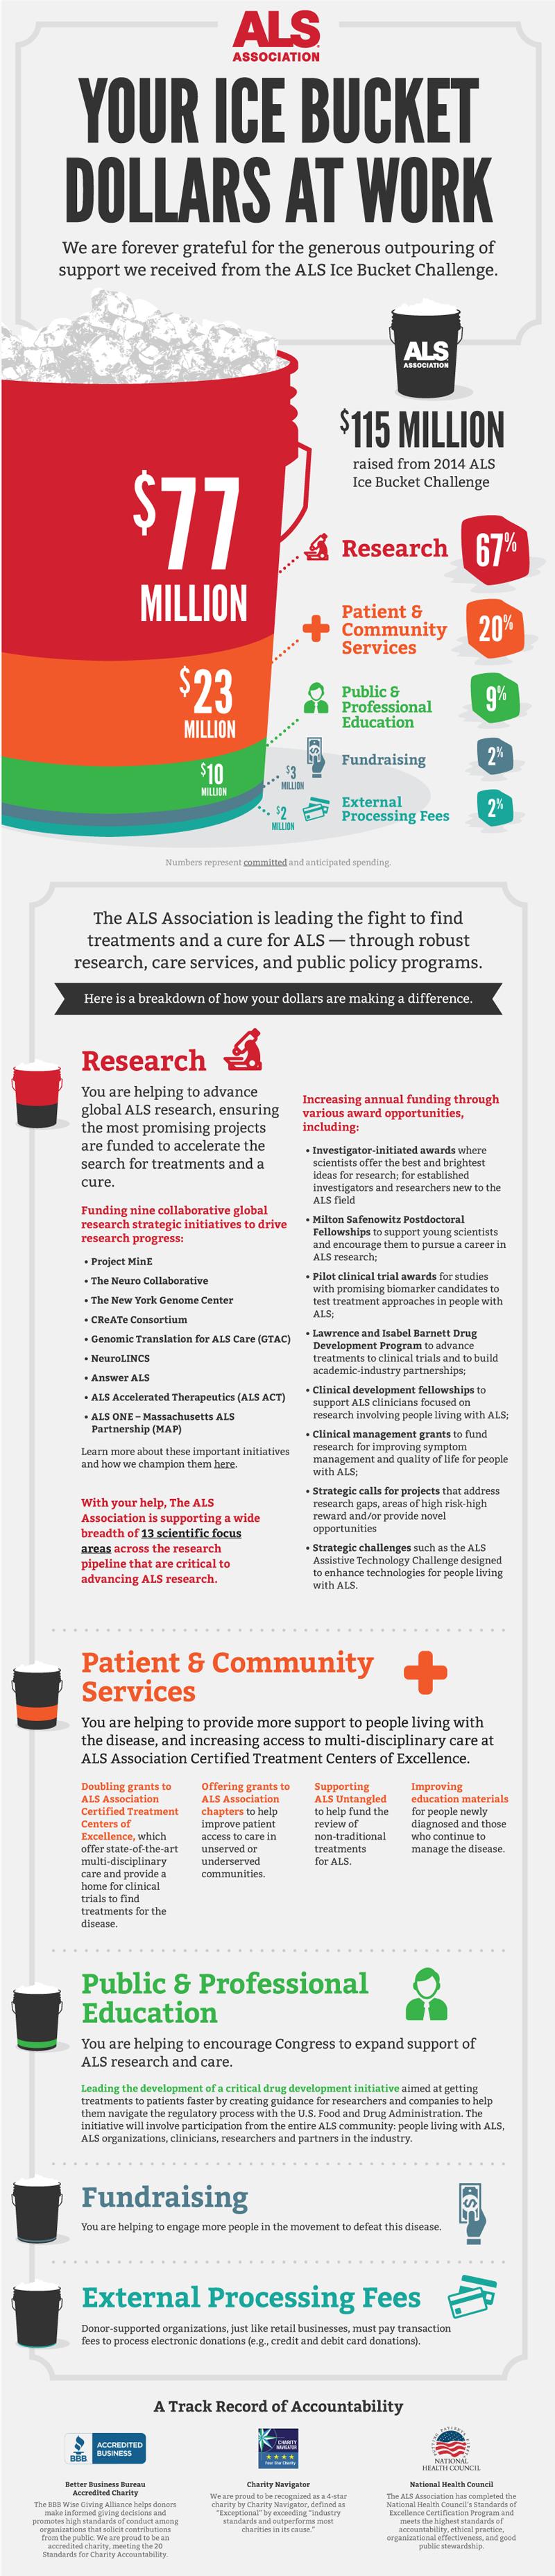 IBC Full infographic